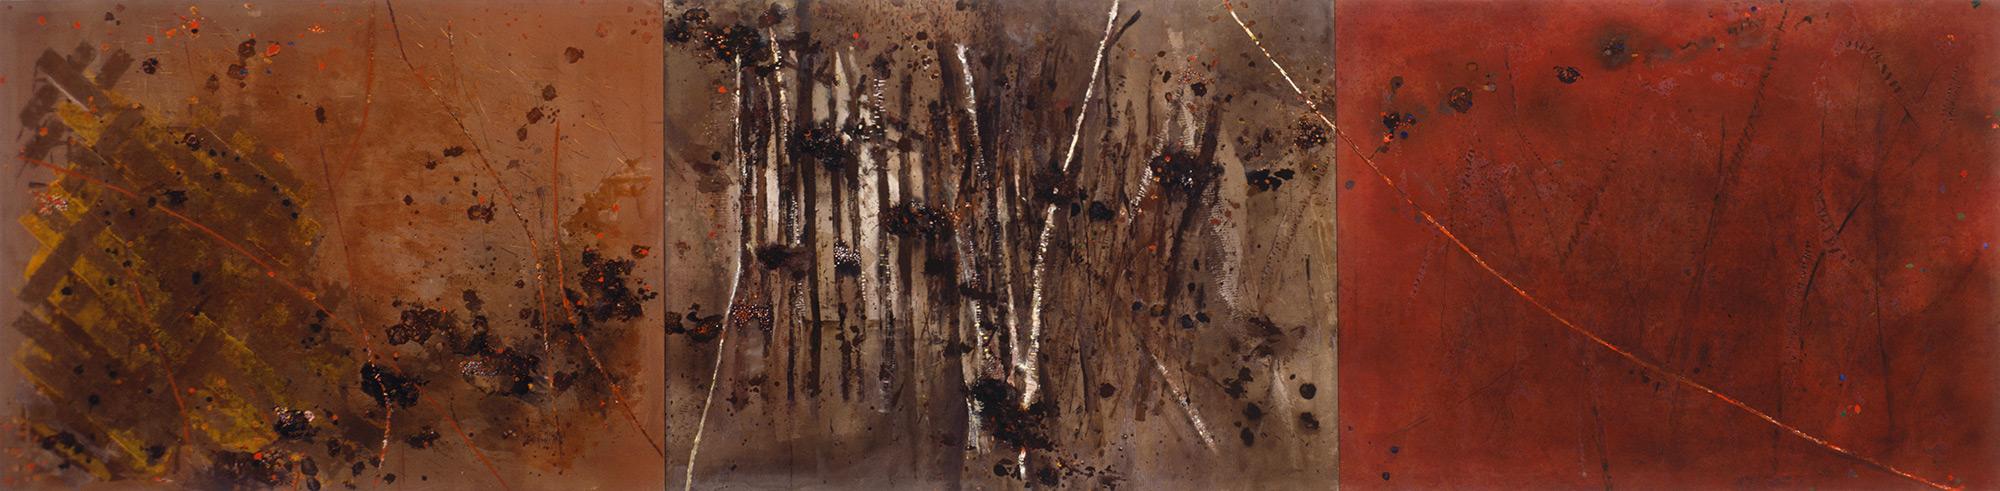 Autumn Spinney Triptych  1982-1996, 168 x 685 cm